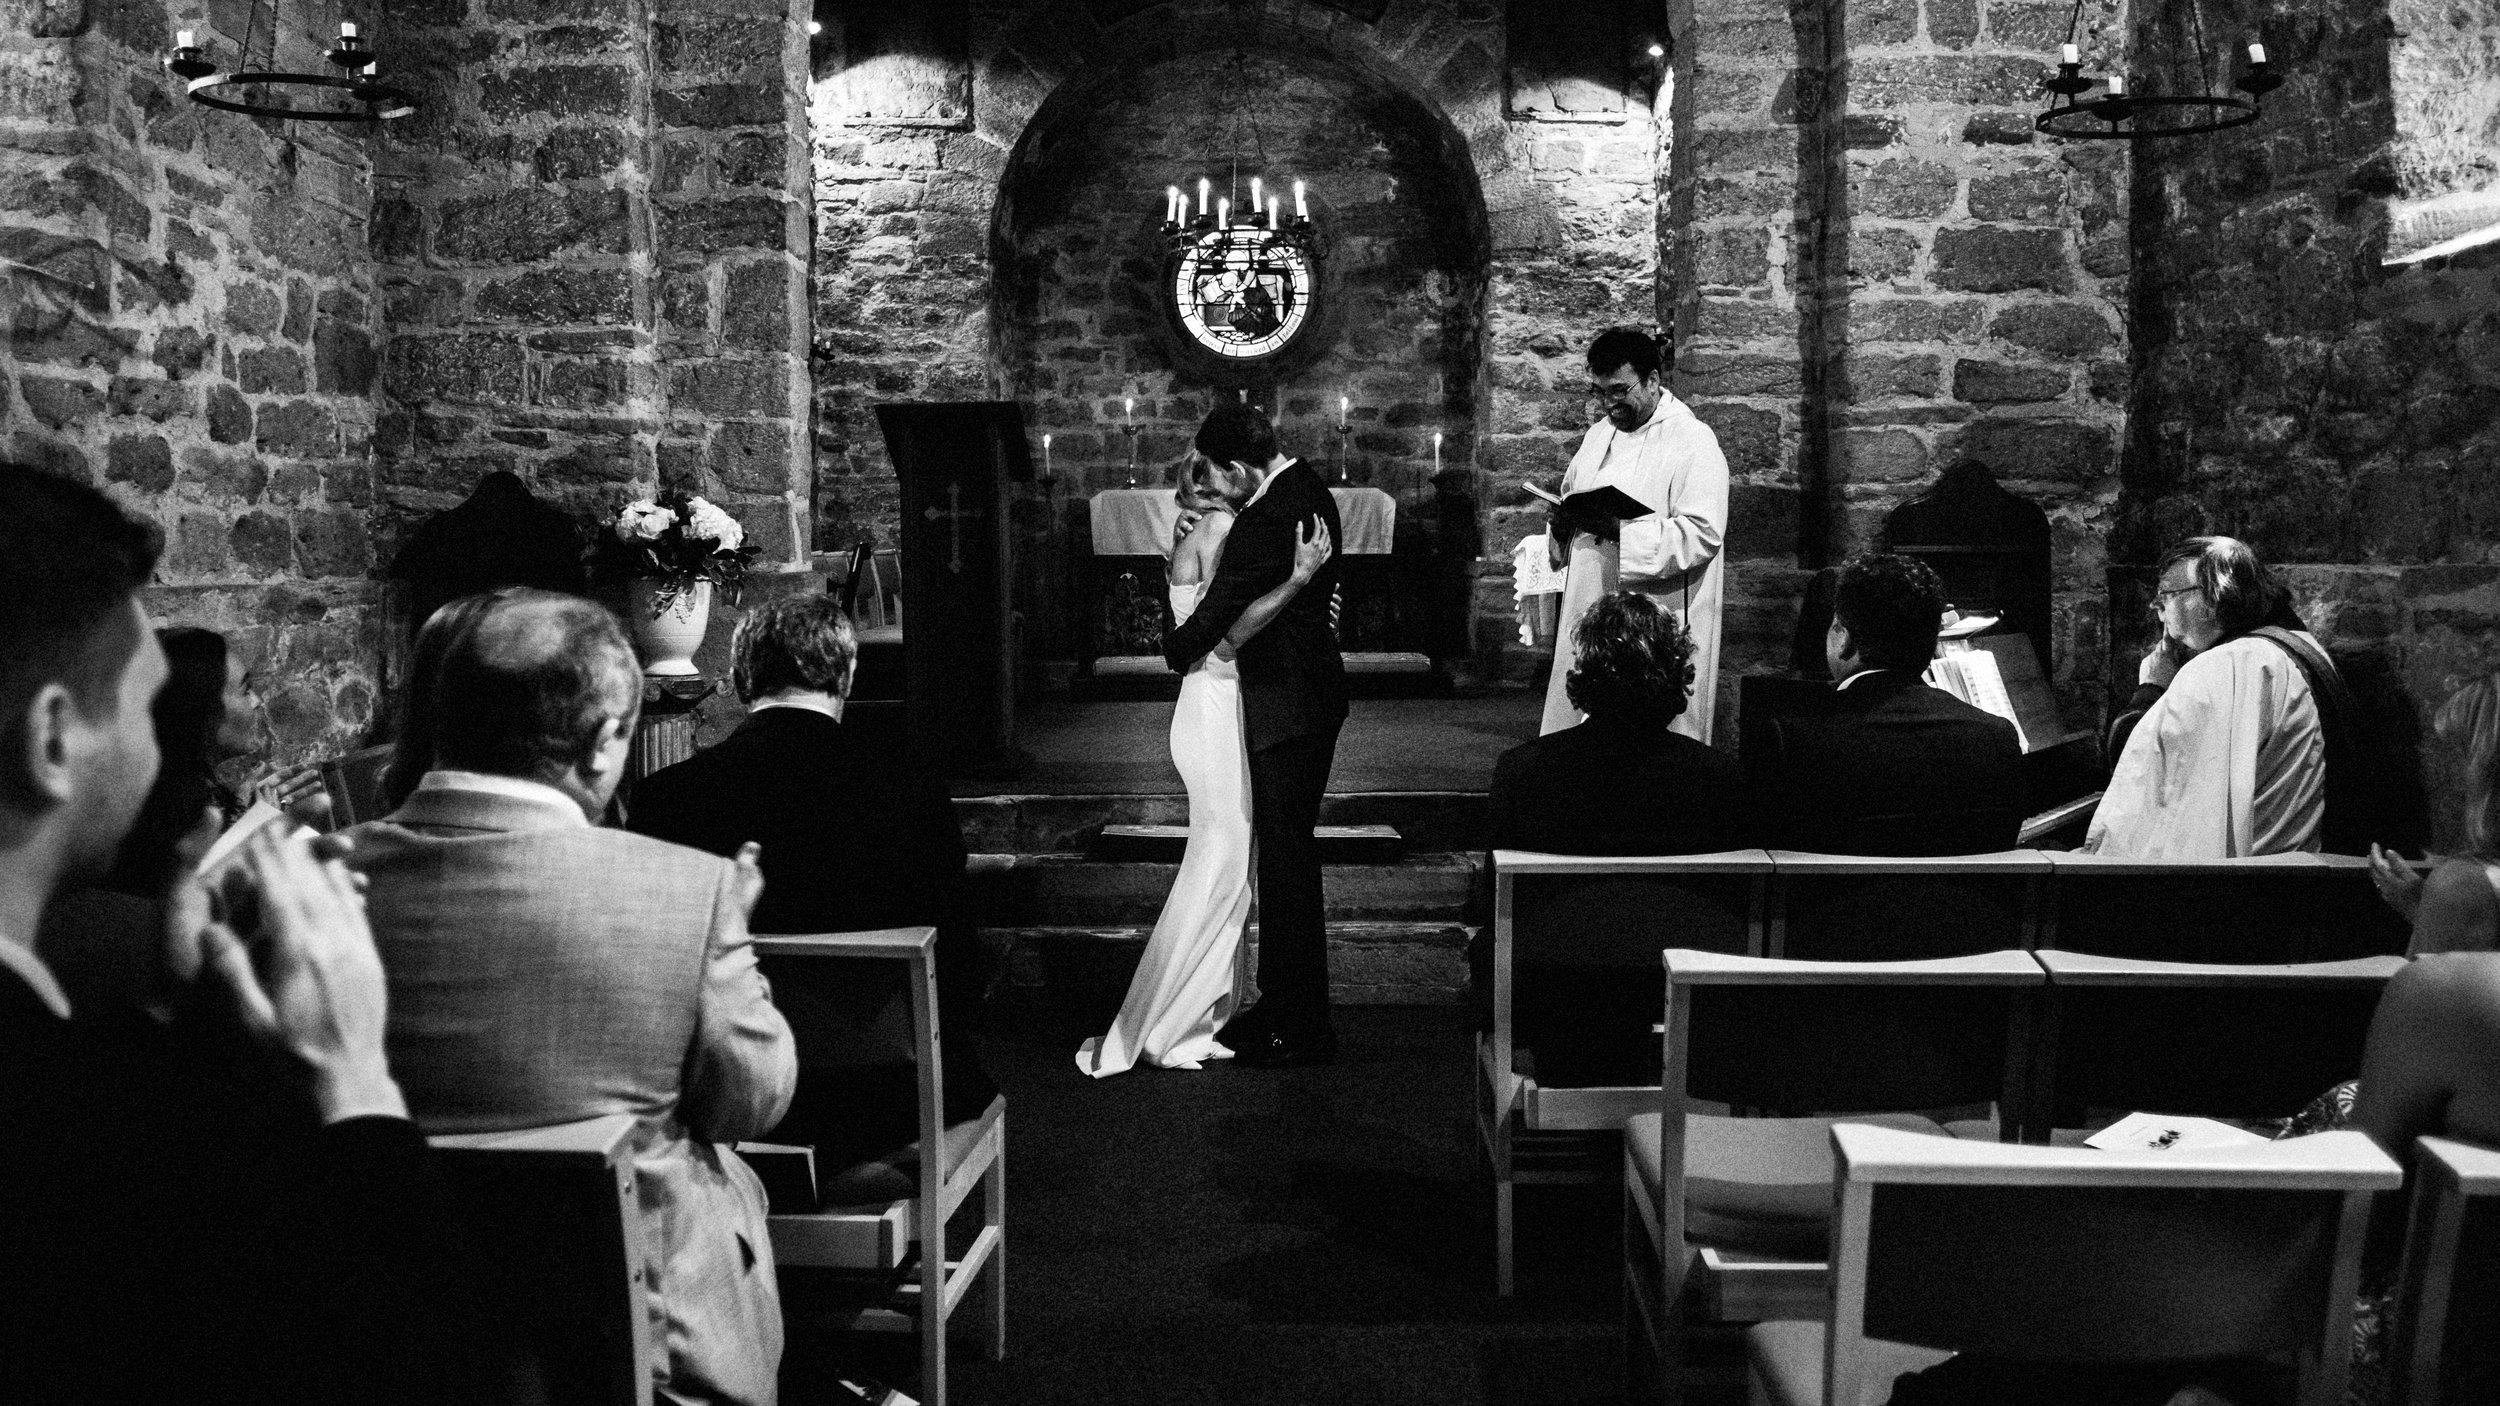 prestbury-cheshire-wedding-photographer-0012.JPG